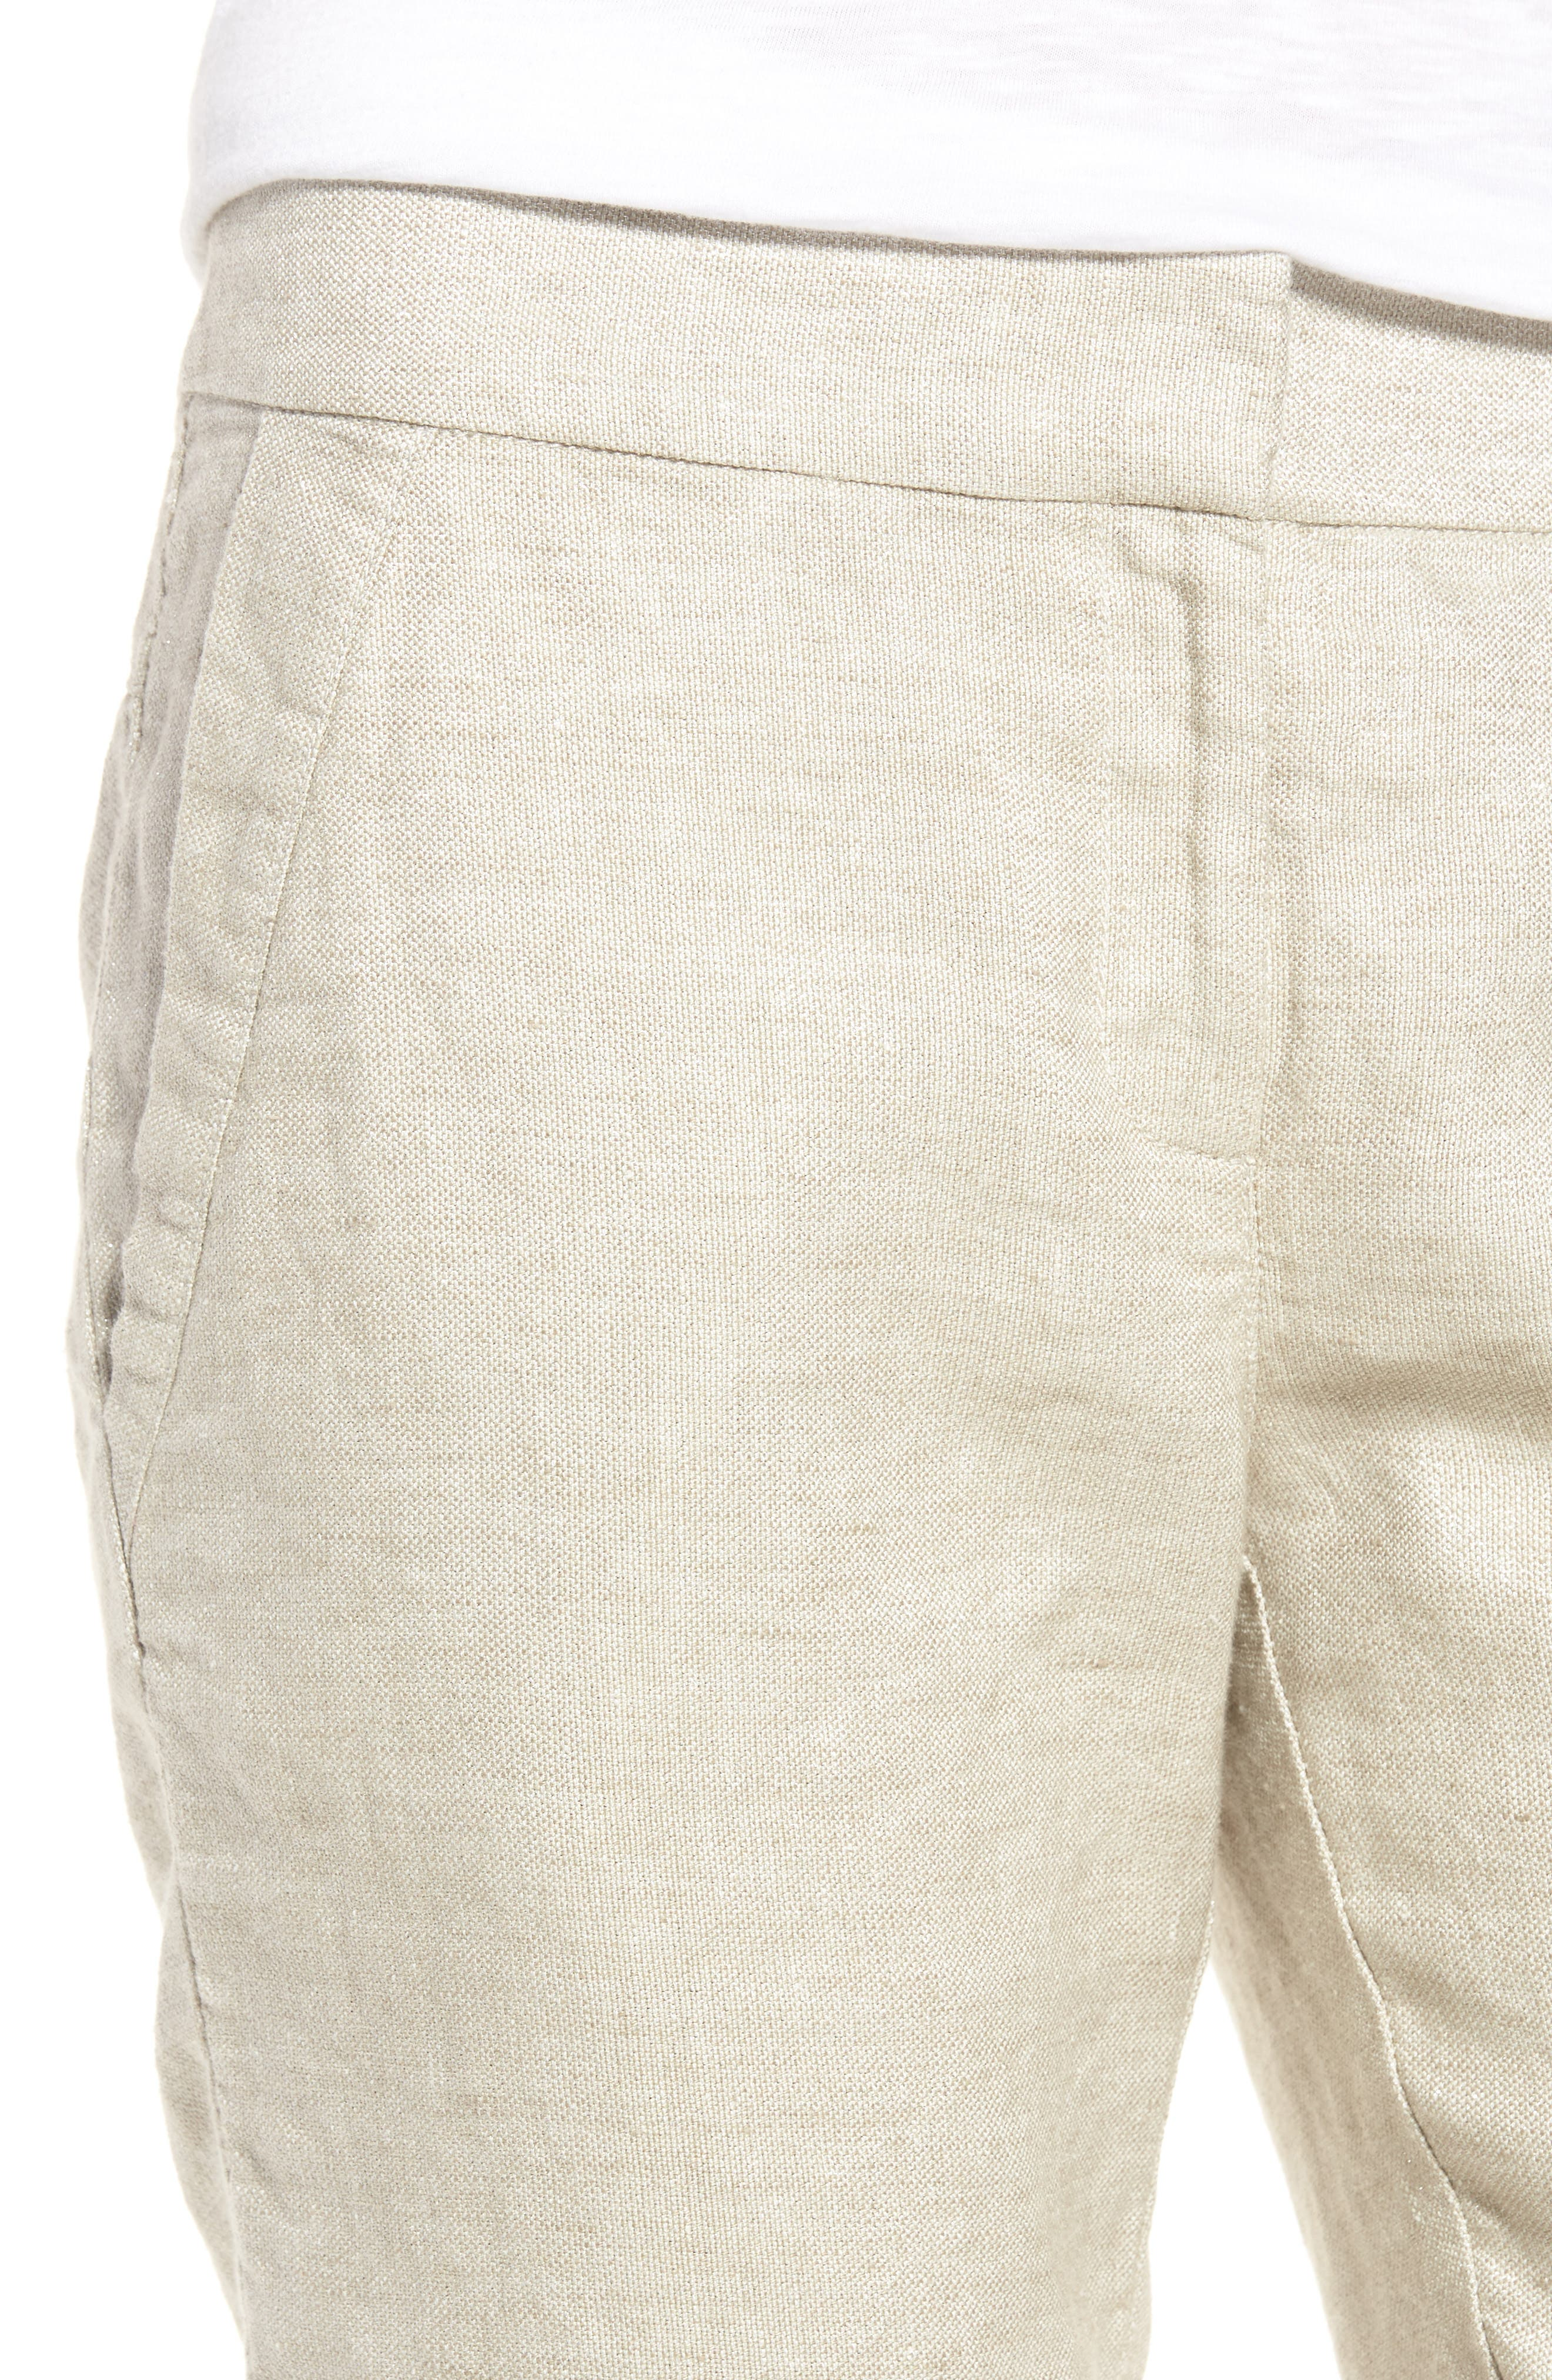 Organic Linen Blend Walking Shorts,                             Alternate thumbnail 4, color,                             257